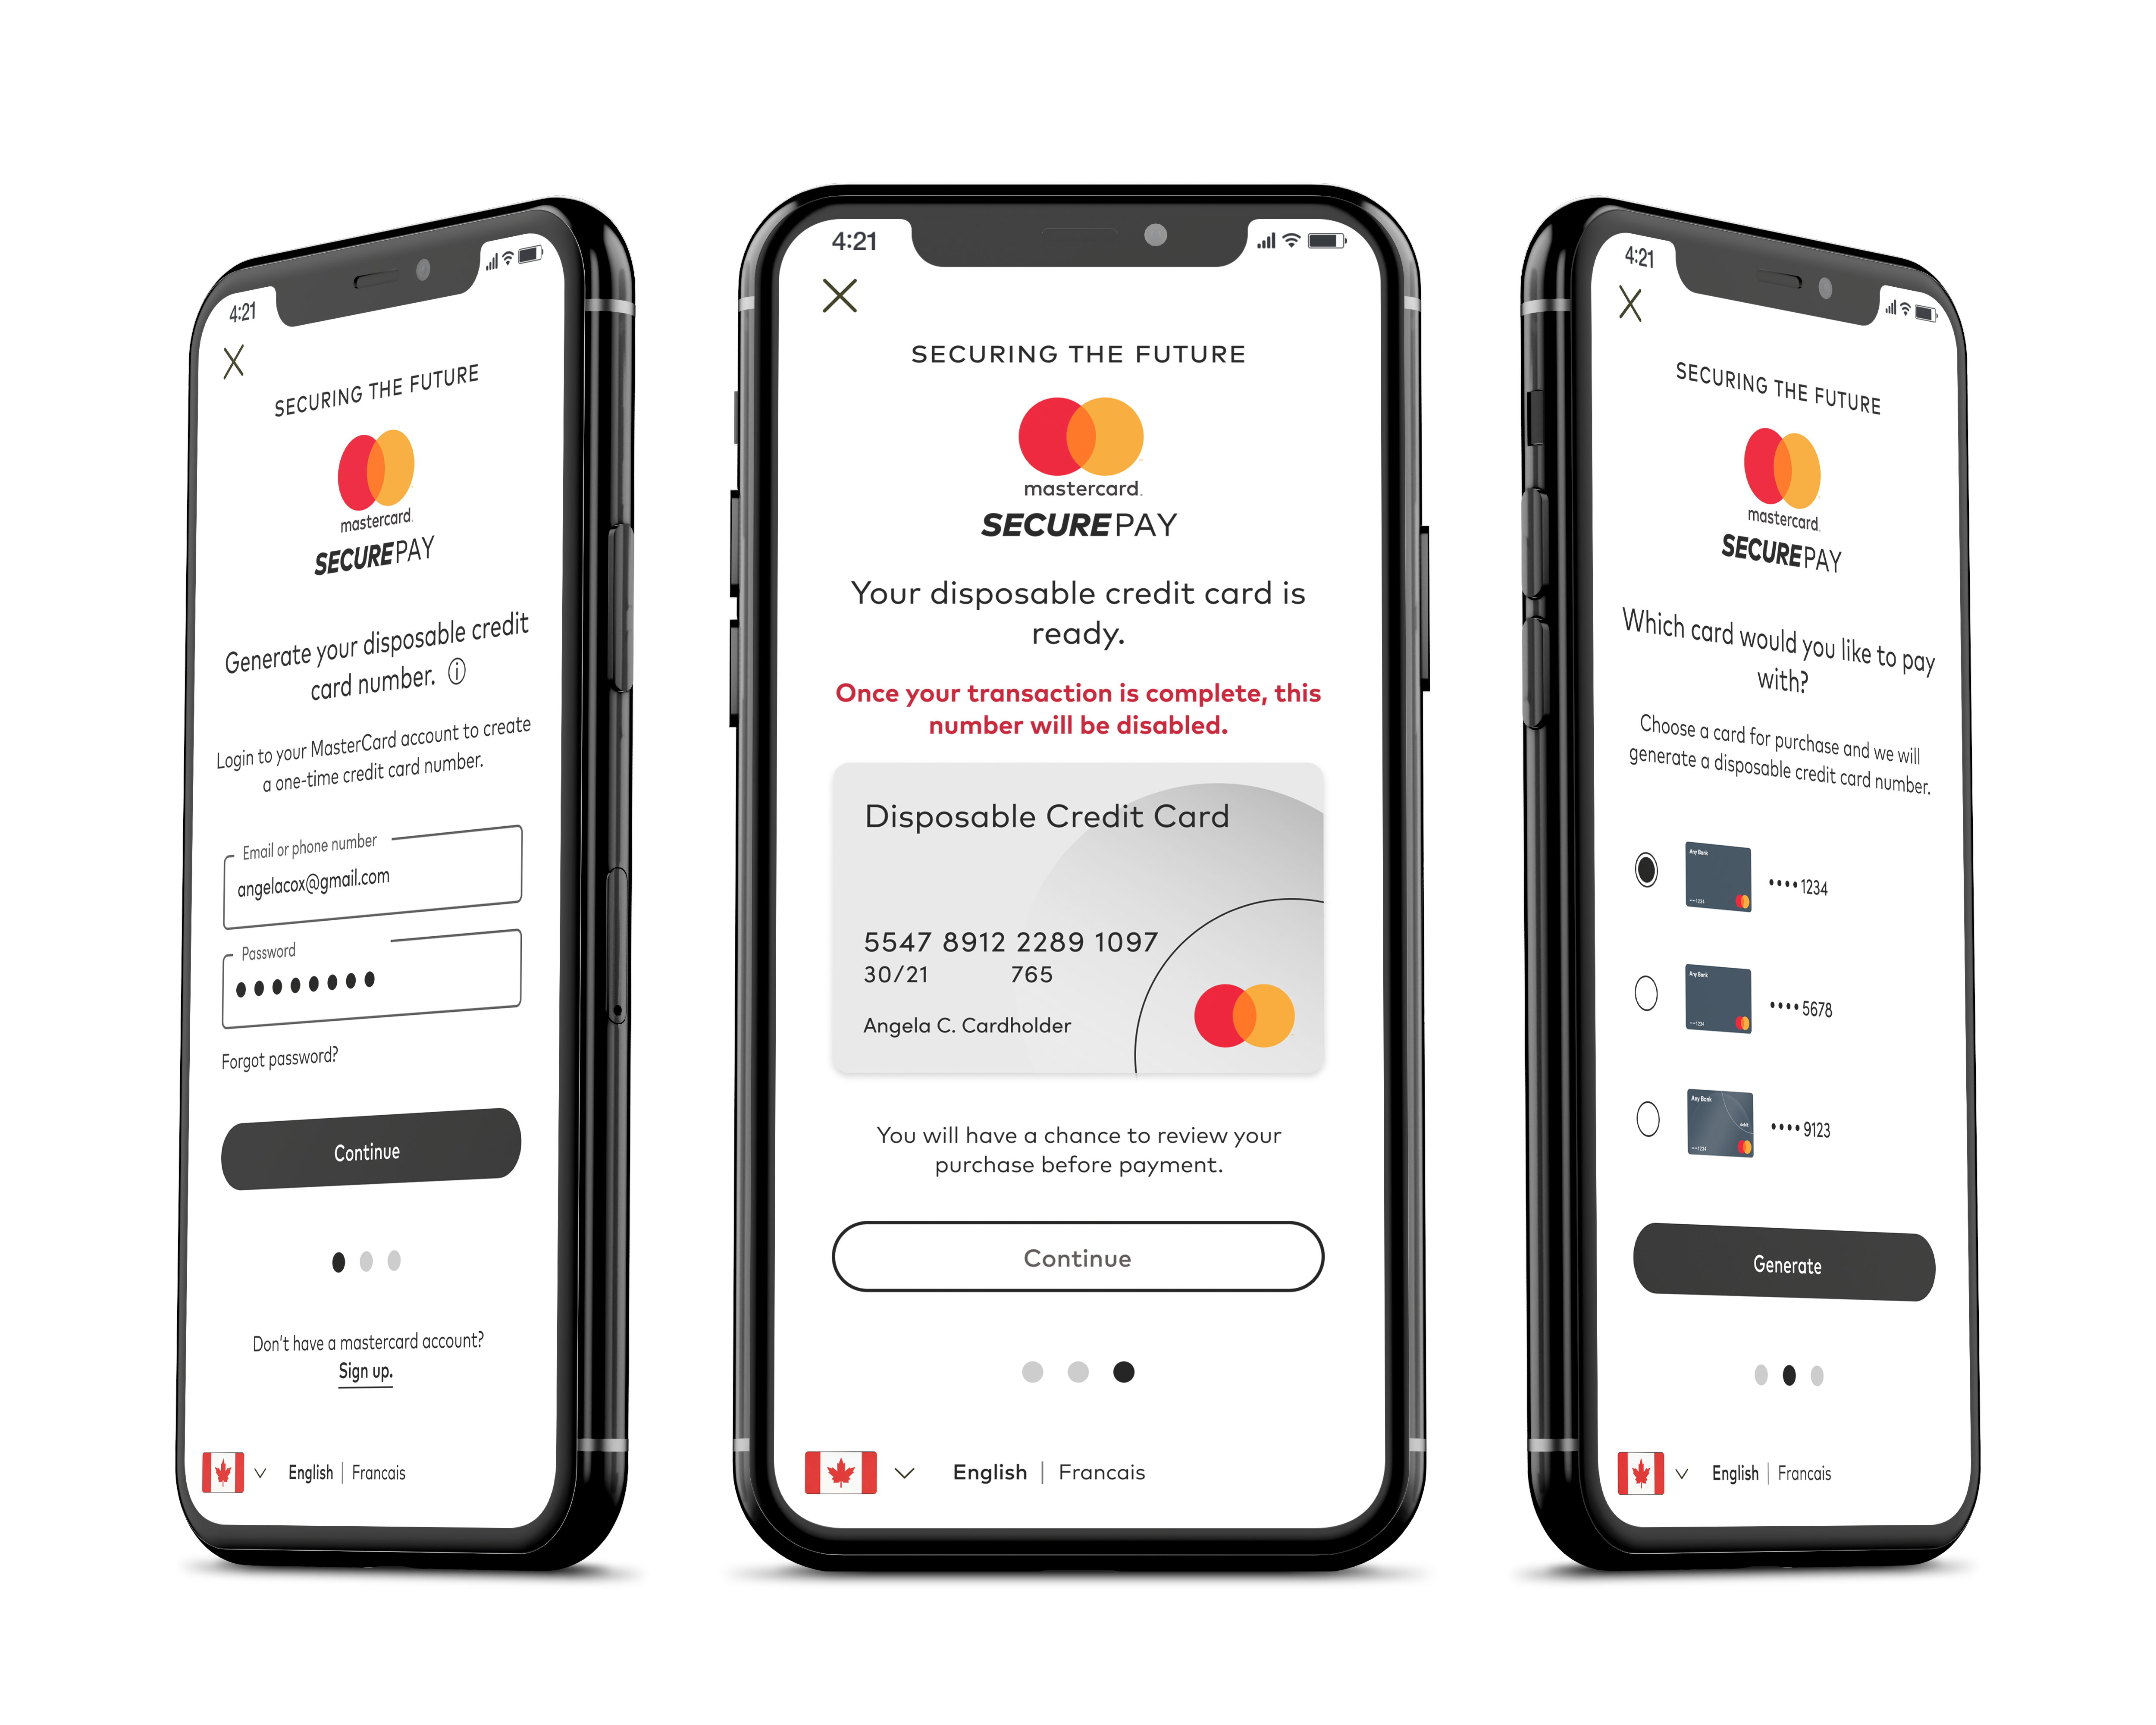 Mockup of SecurePay in iPhone